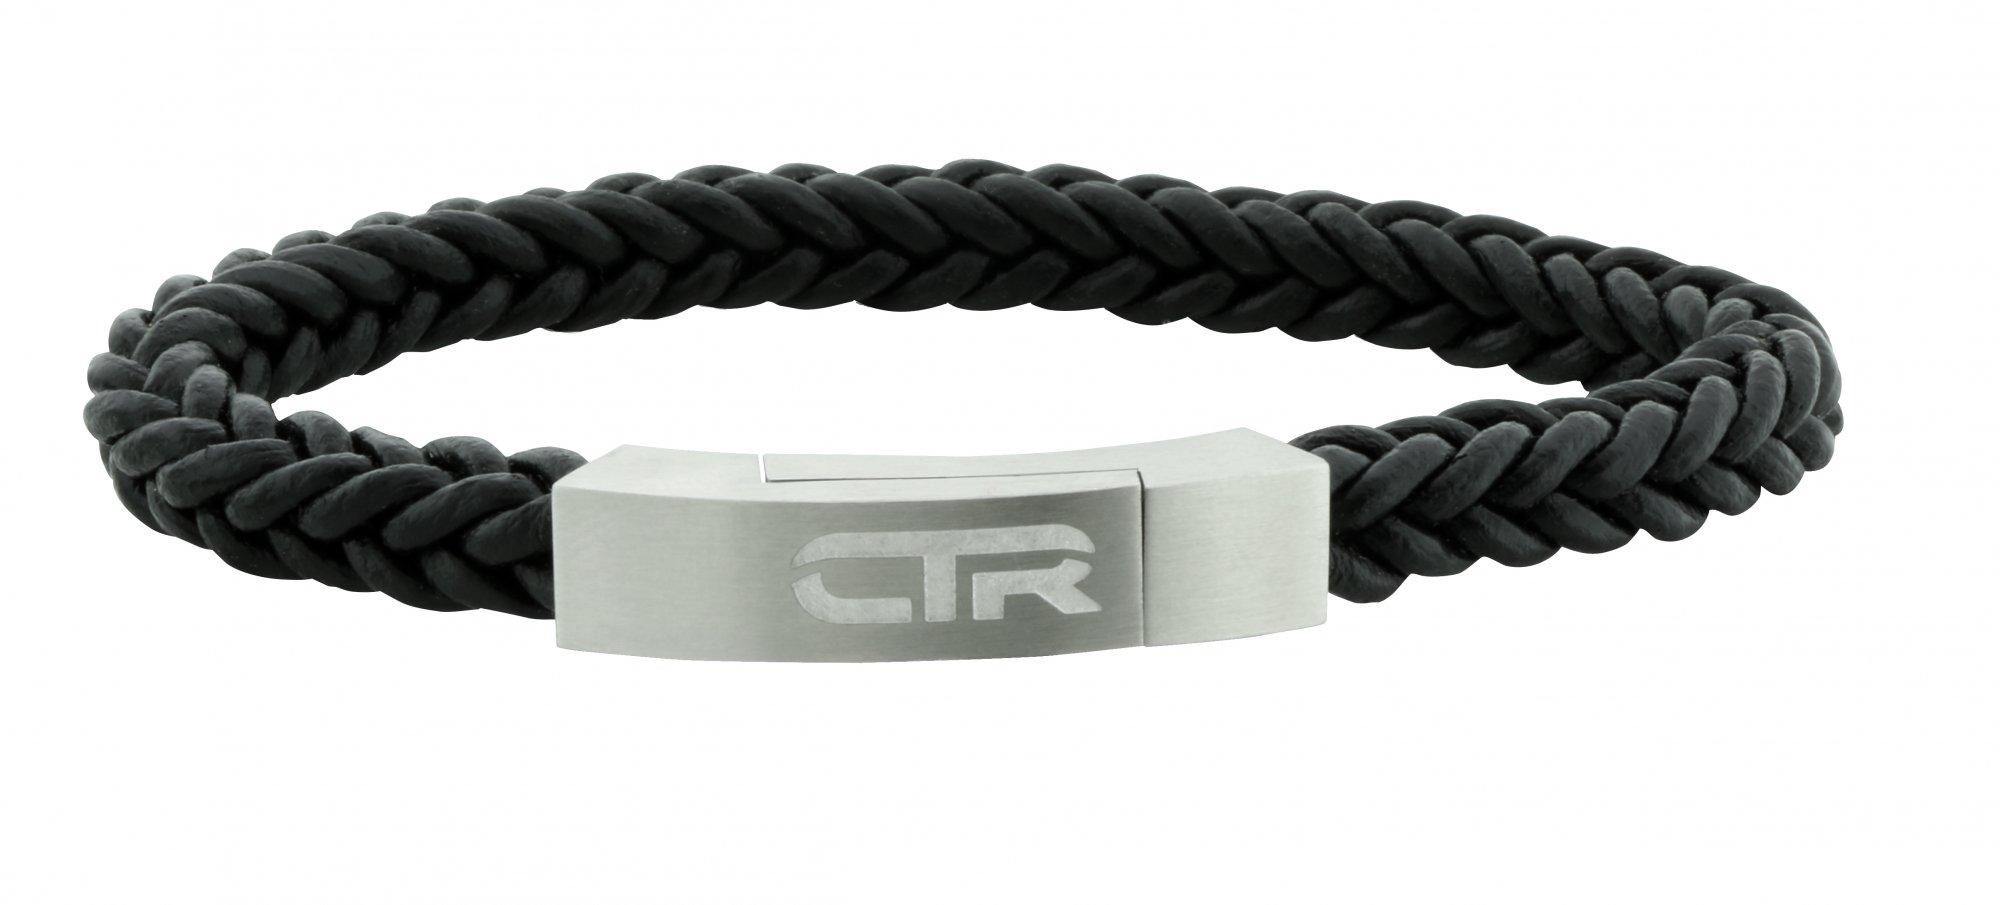 Leather CTR Bracelet Flat Surface